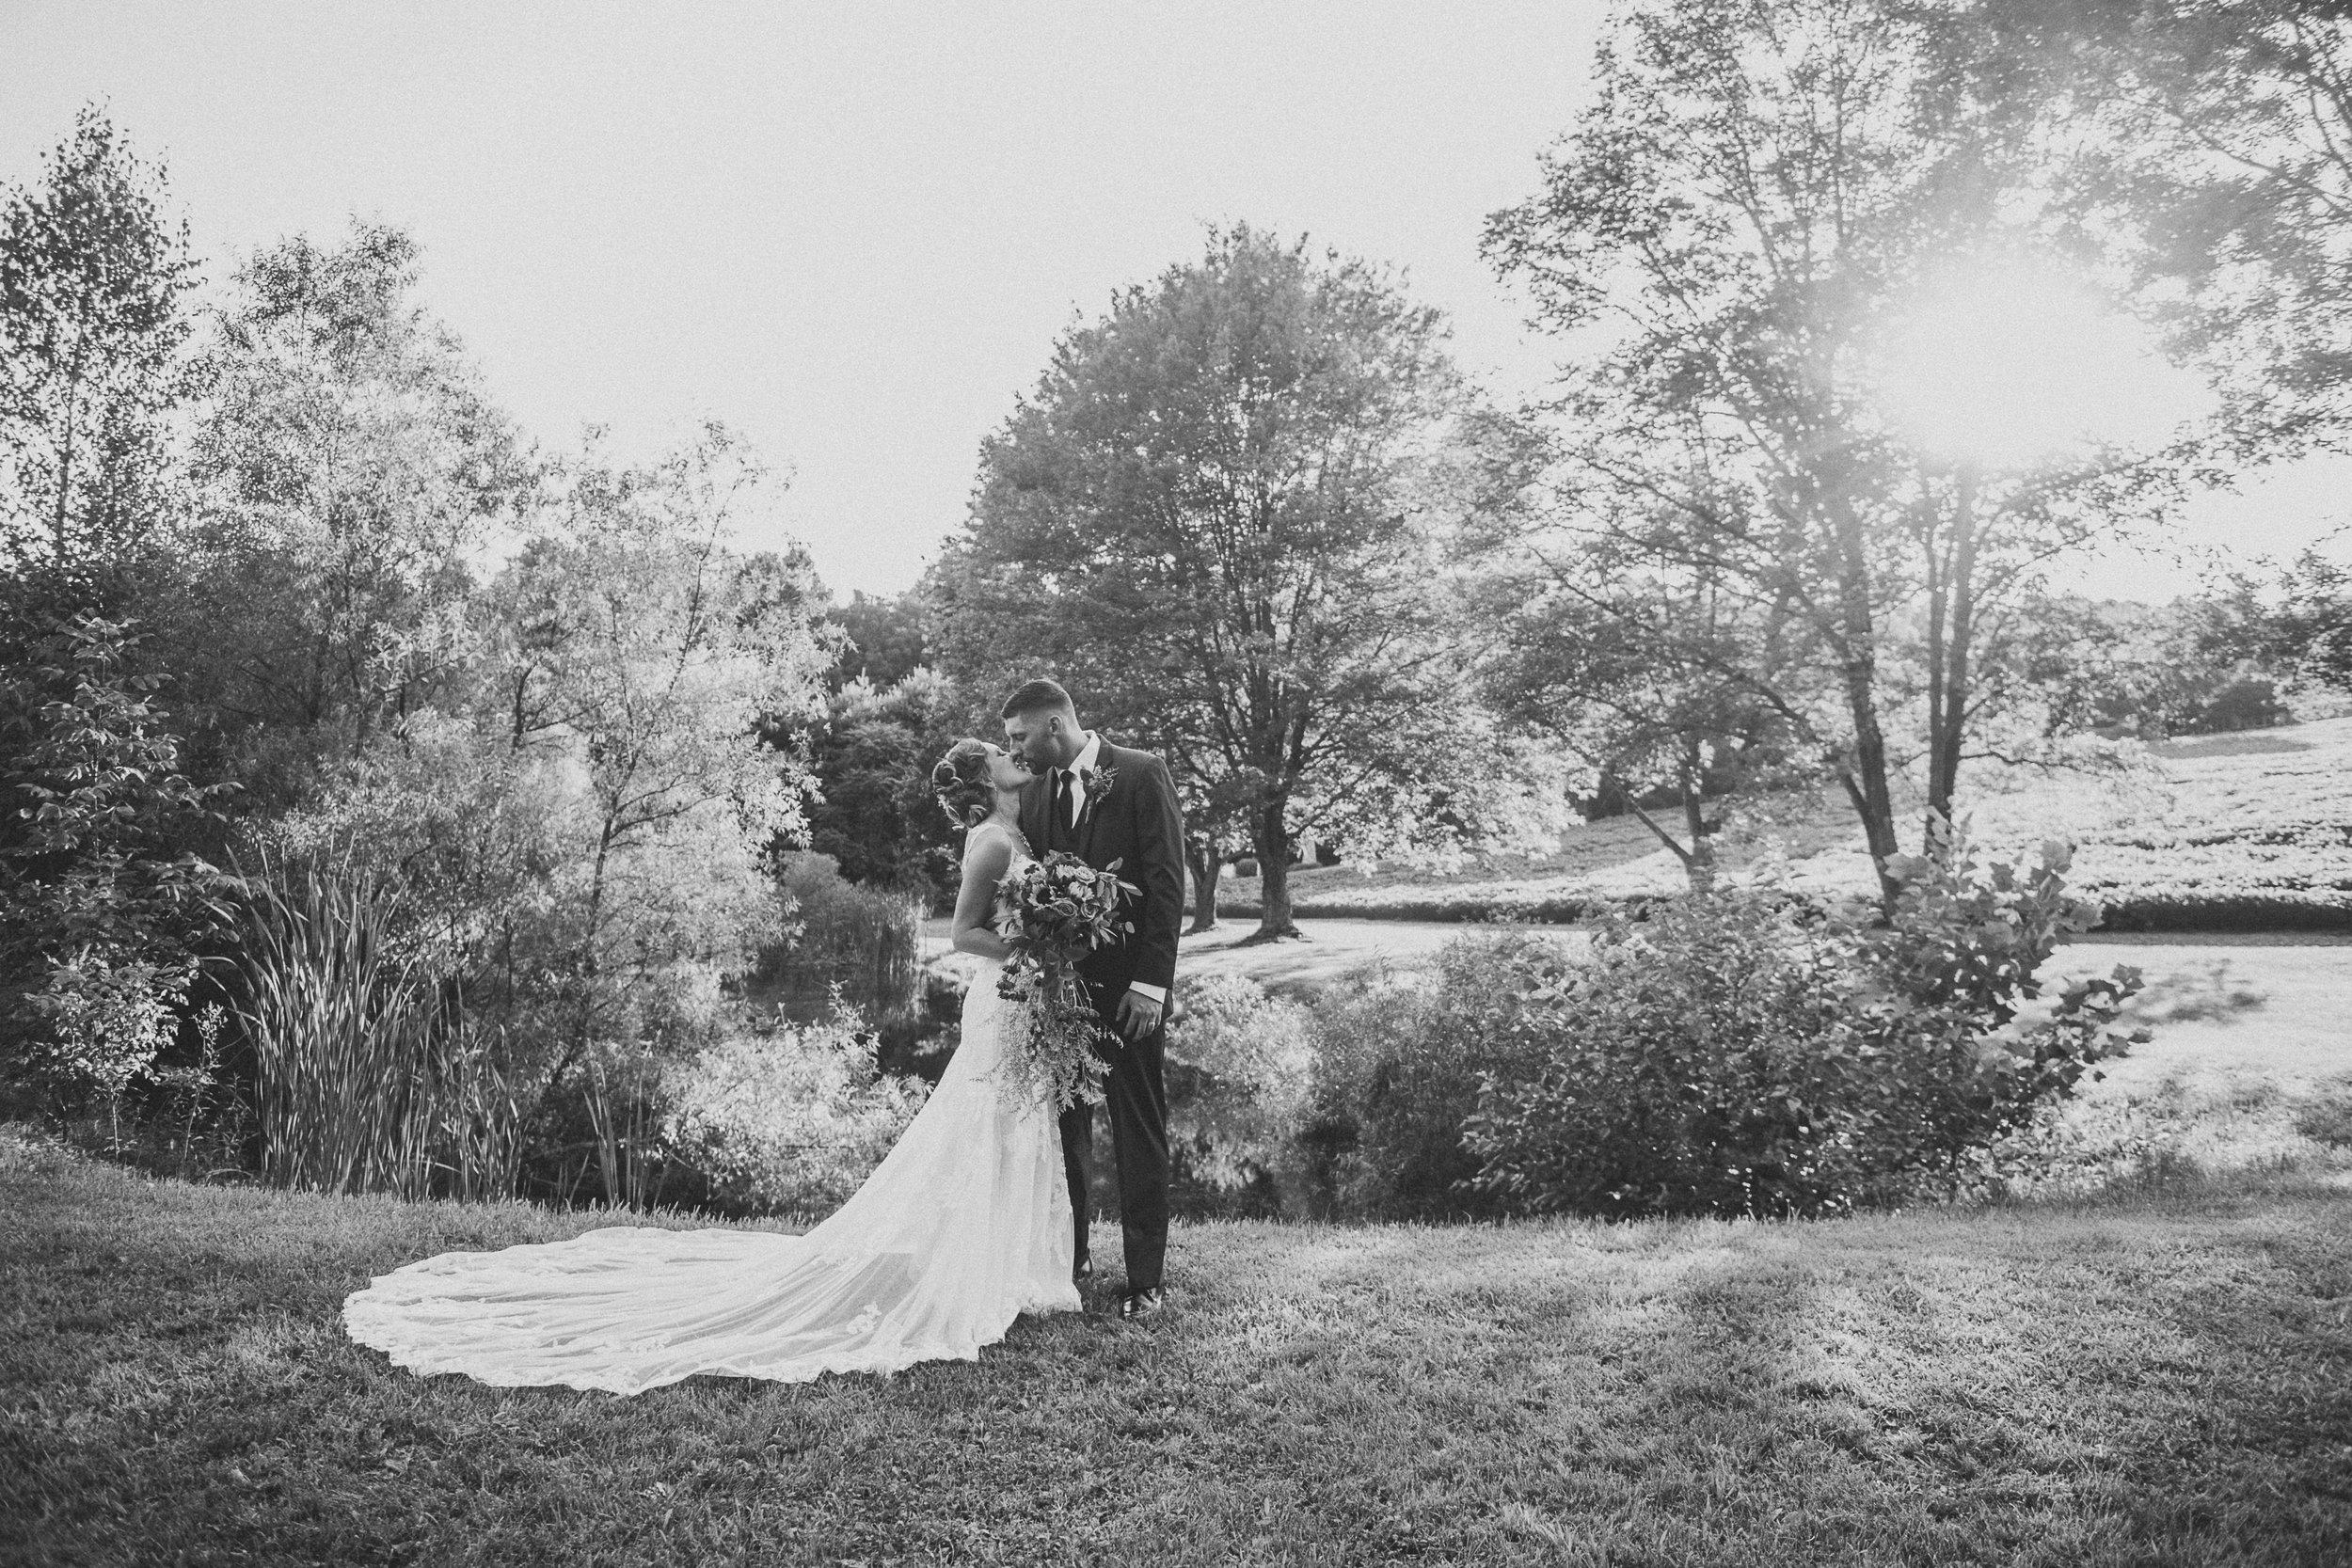 070ninalilyphoto-groveatkemptonwedding-hicksblog.jpg